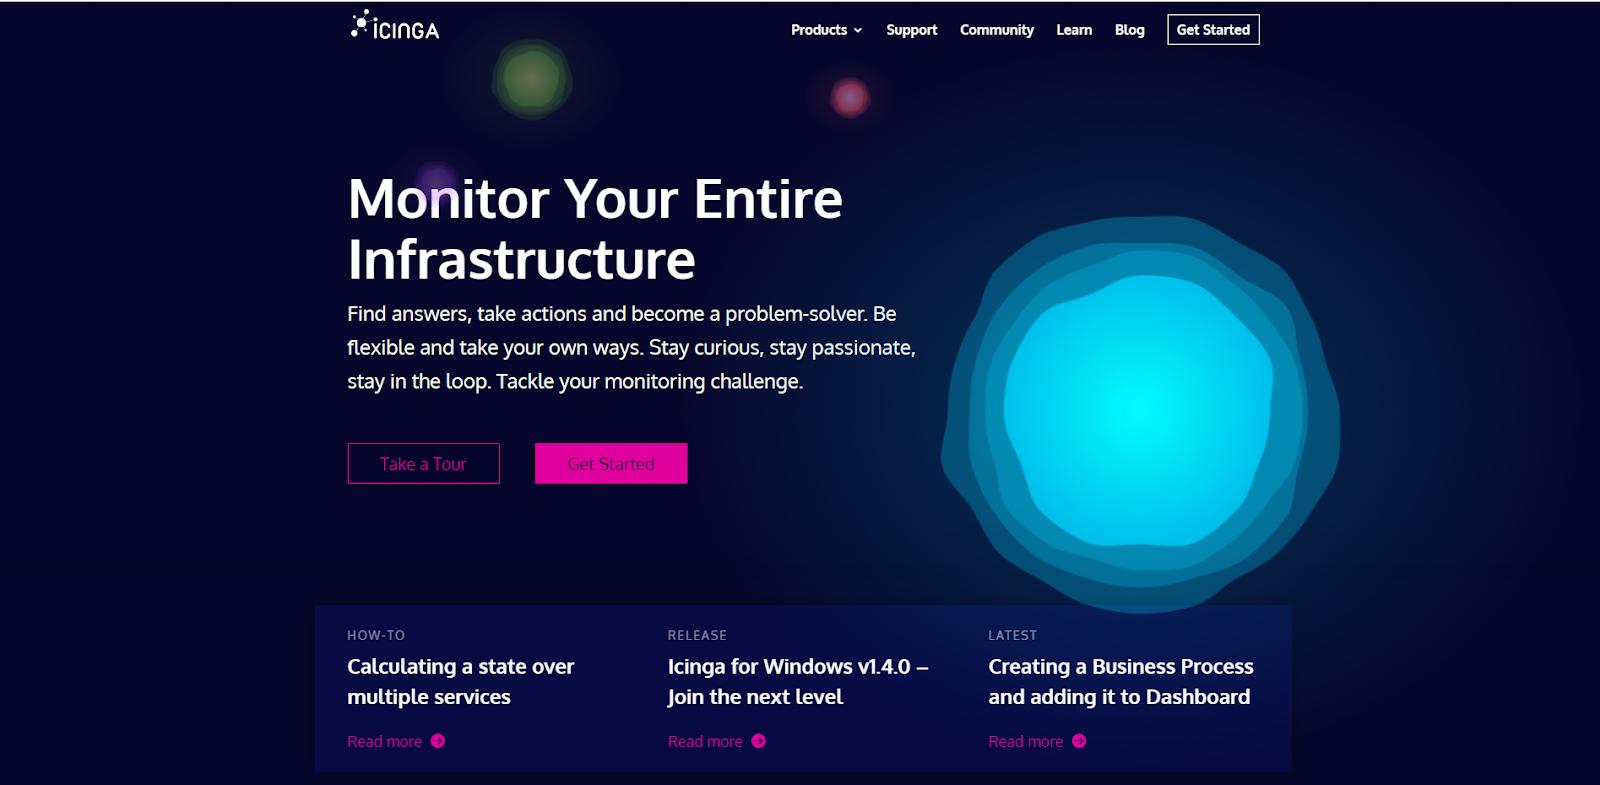 Icinga Network Monitoring Tool